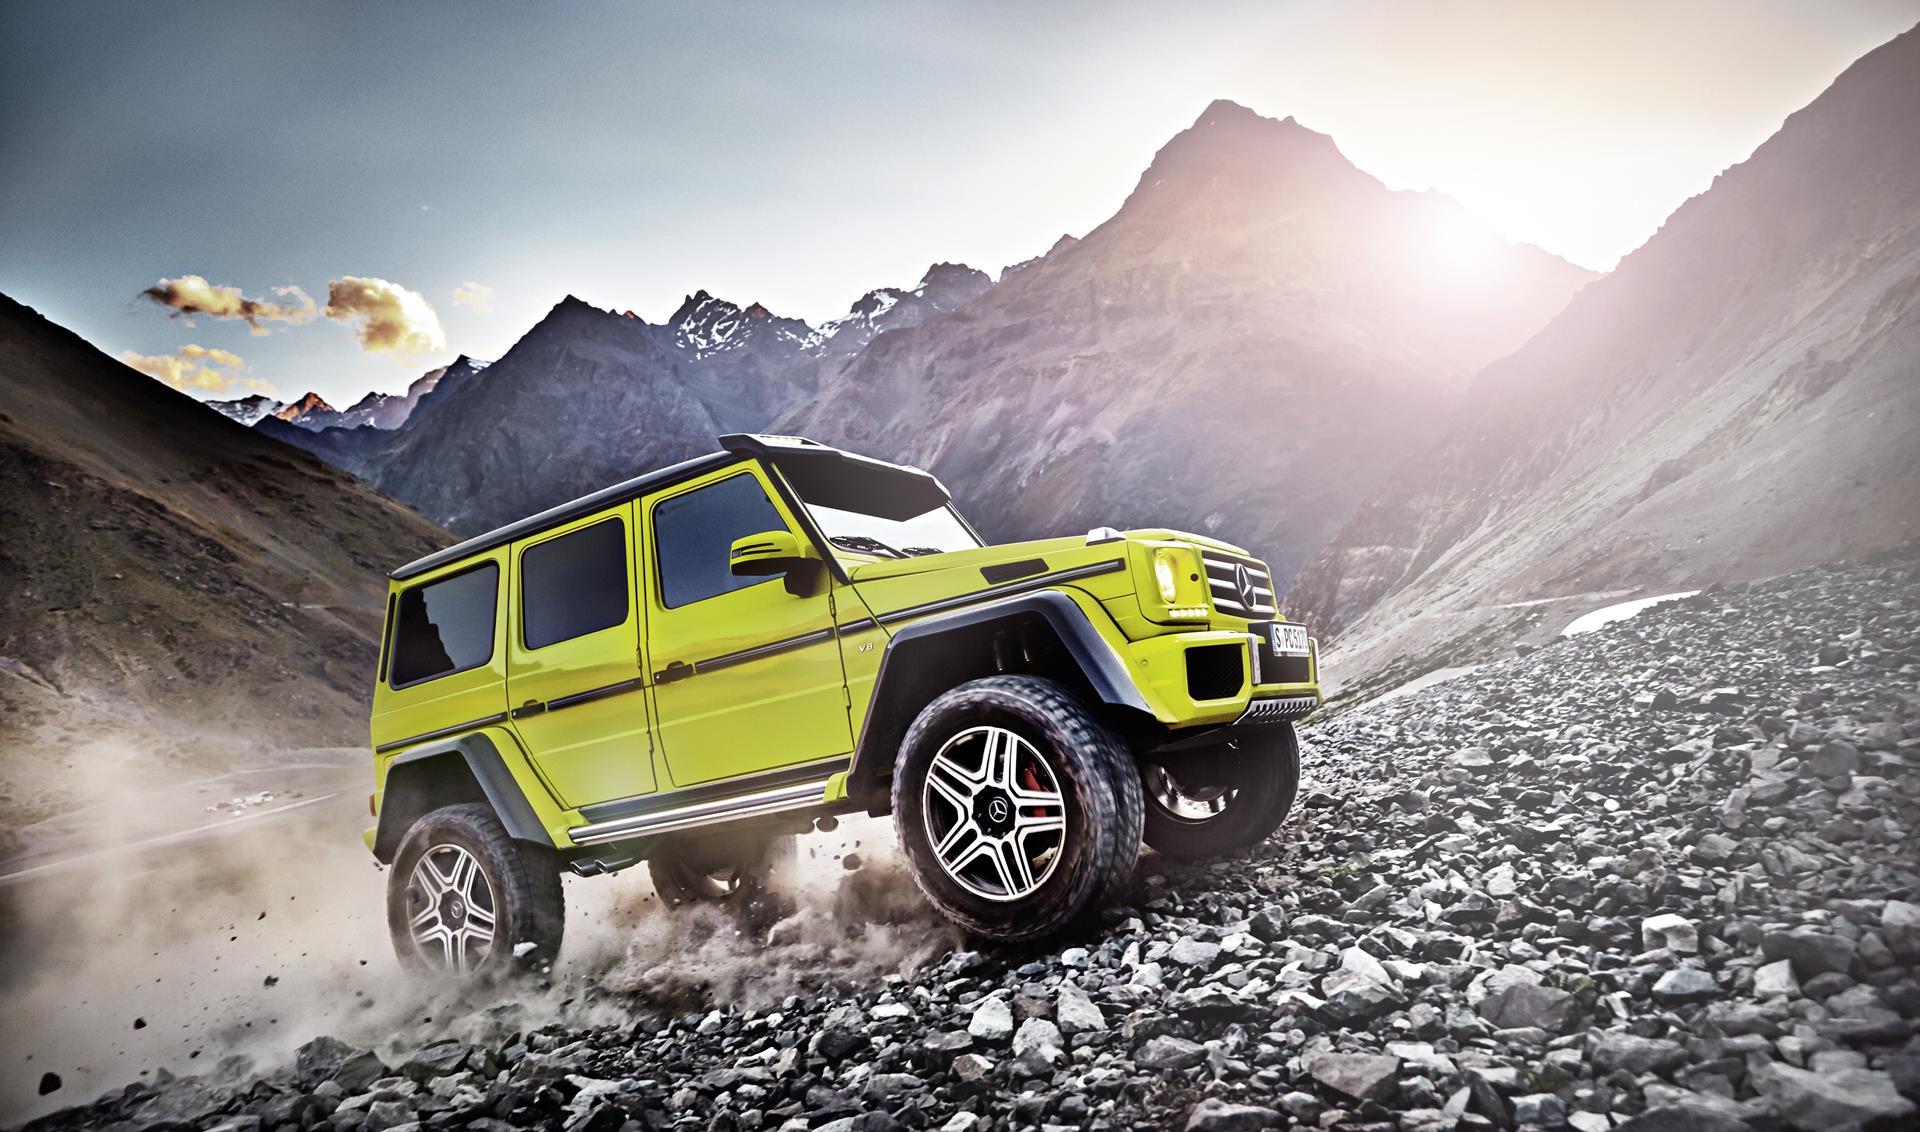 2015 mercedes benz g500 4x4 2 concept news and information for Mercedes benz 4 x 4